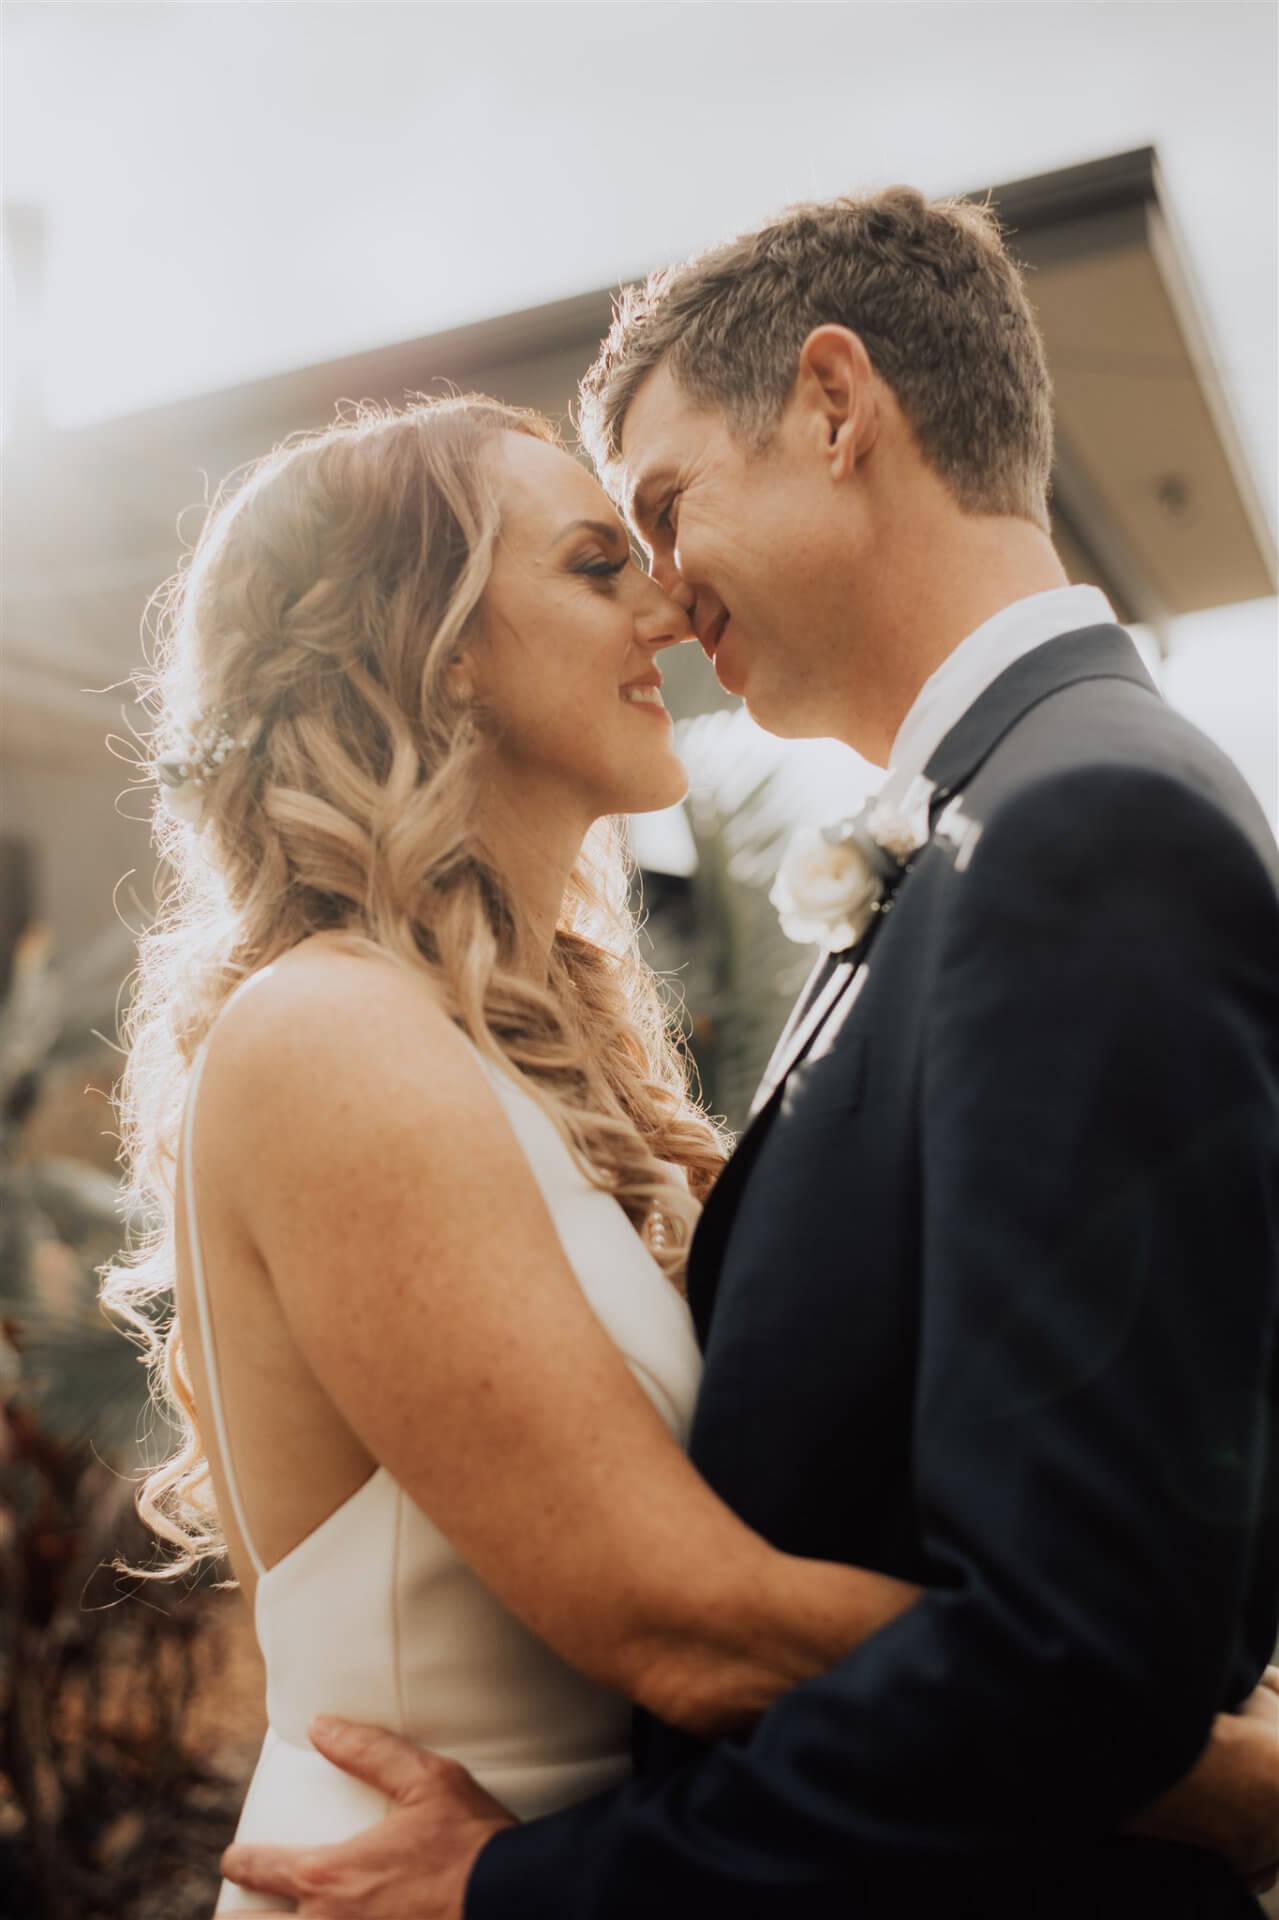 Best Wedding Coordinator Brisbane QLD Toowoomba Bird and Boy Photography